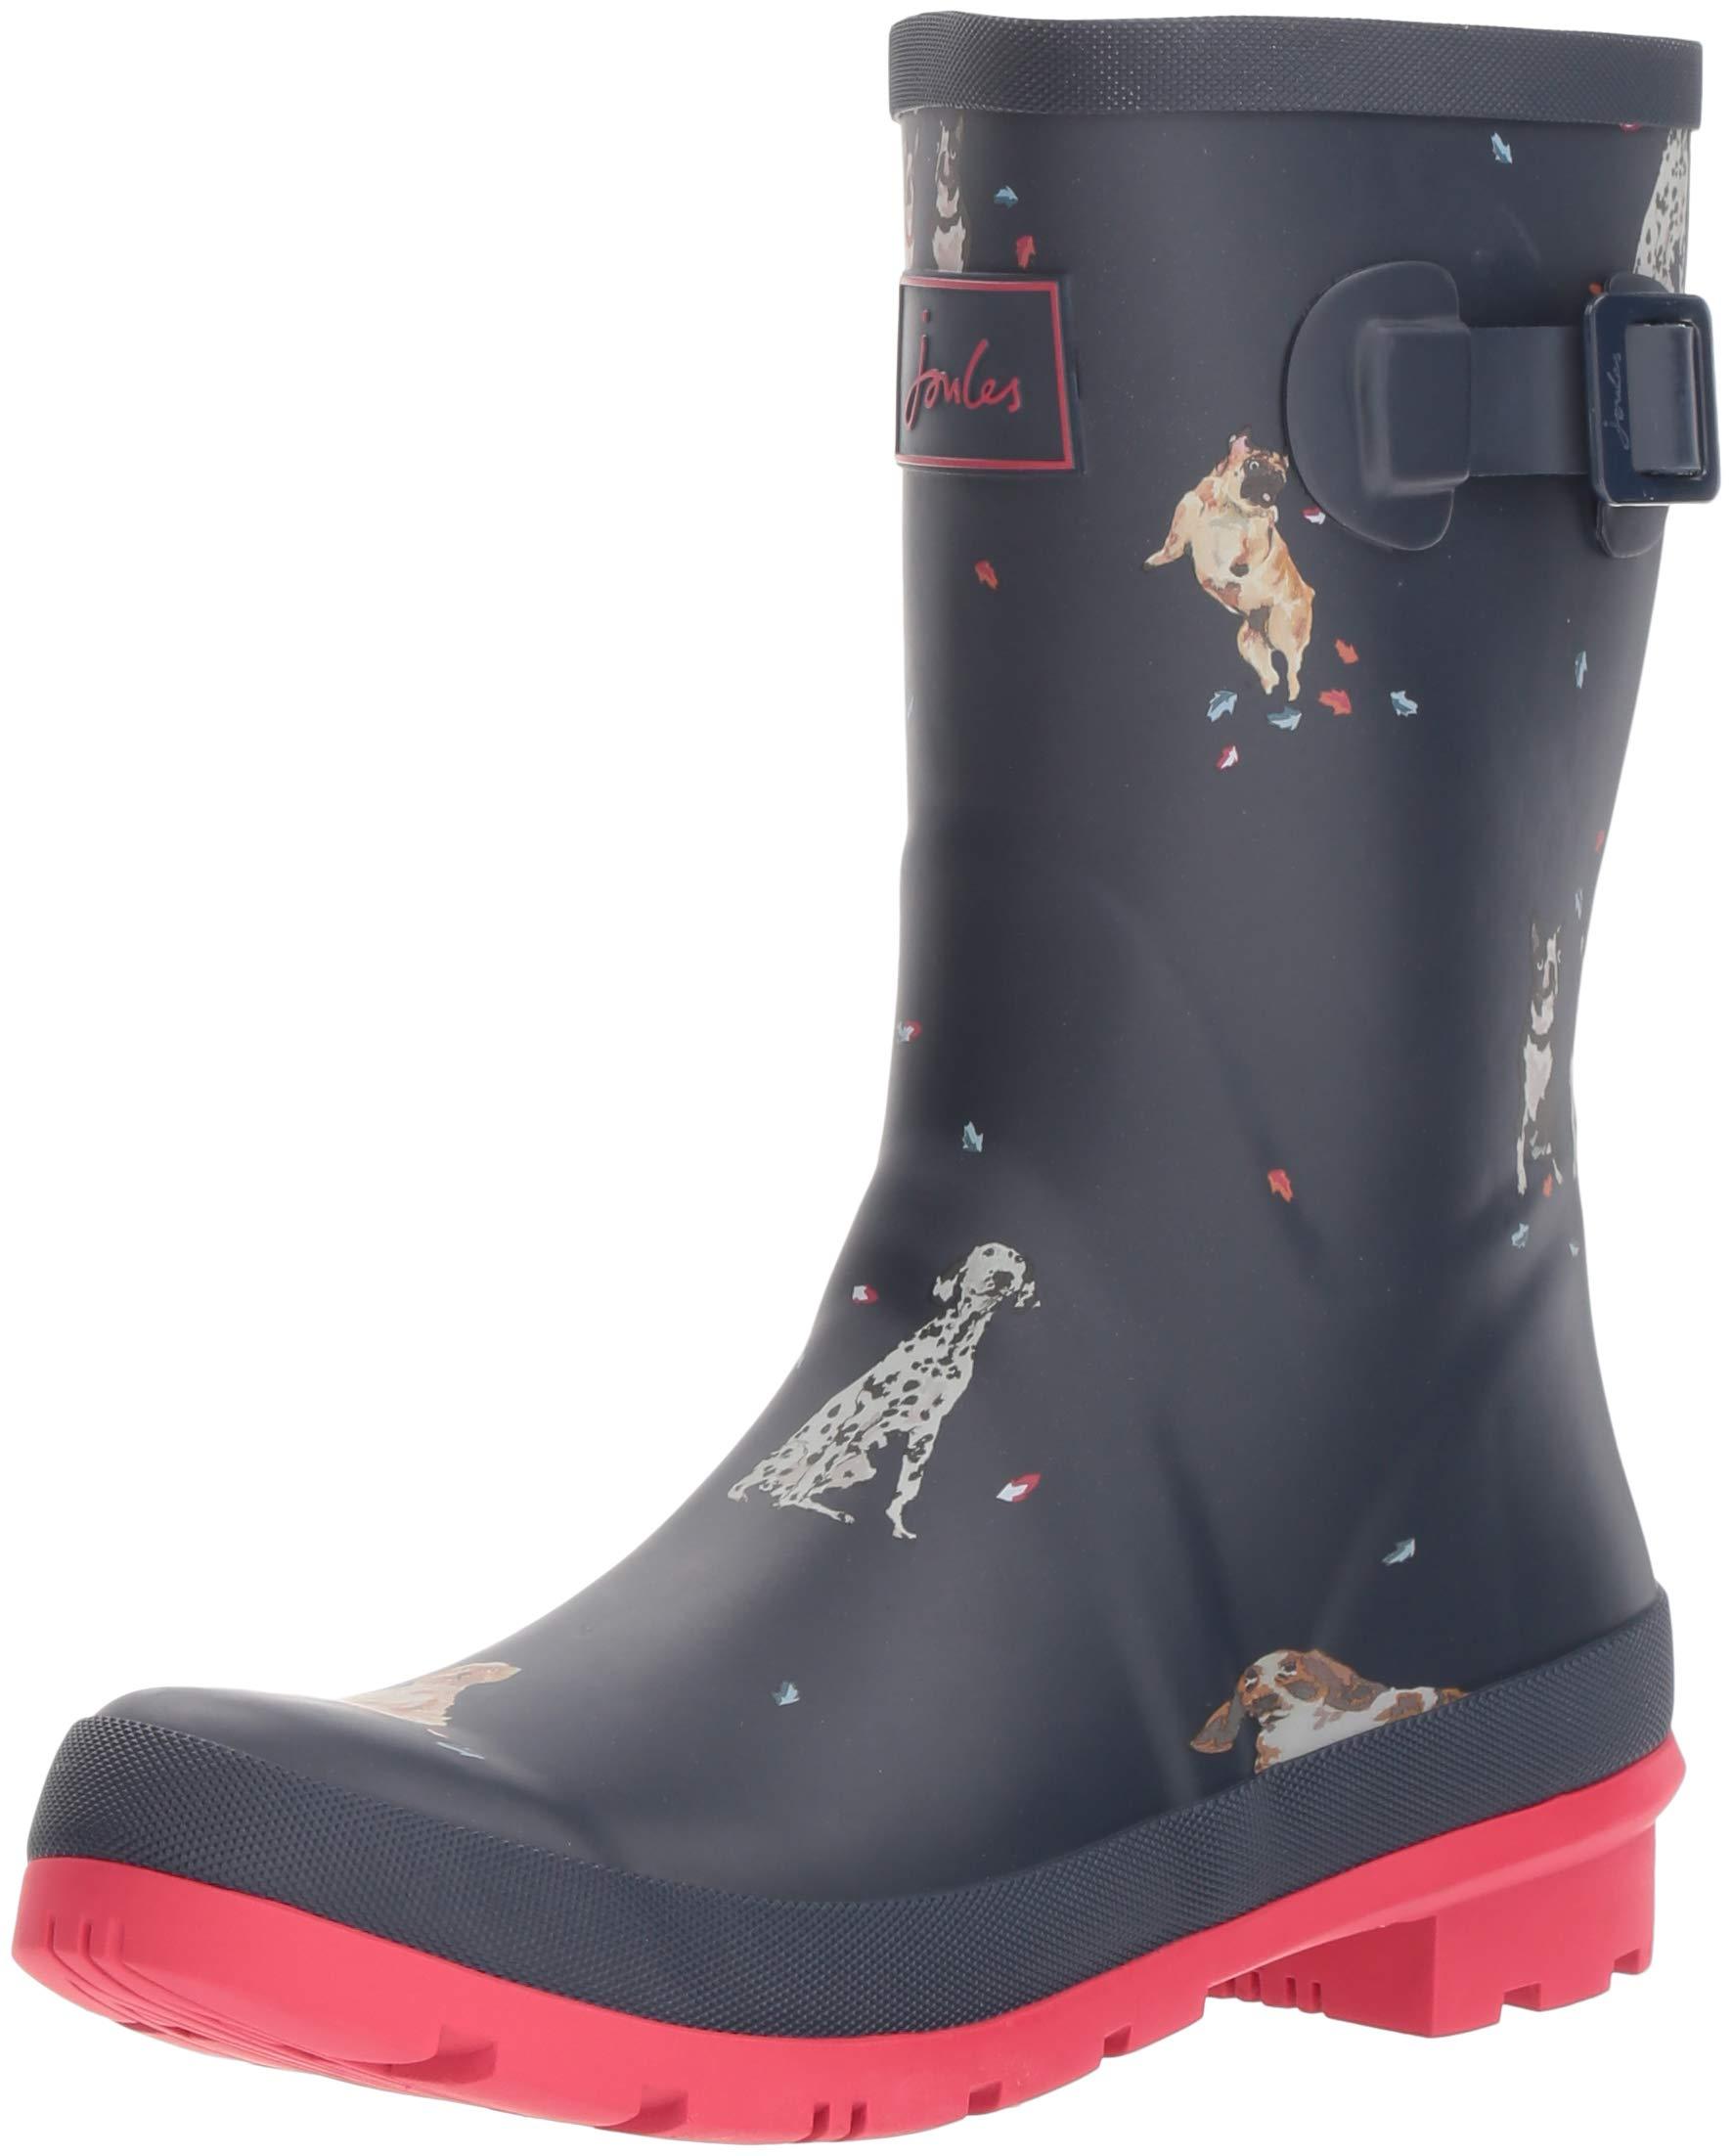 Joules Women's Wellibob Rain Boot, French Navy Chestnut Leaves, 6 Medium UK (8 US)